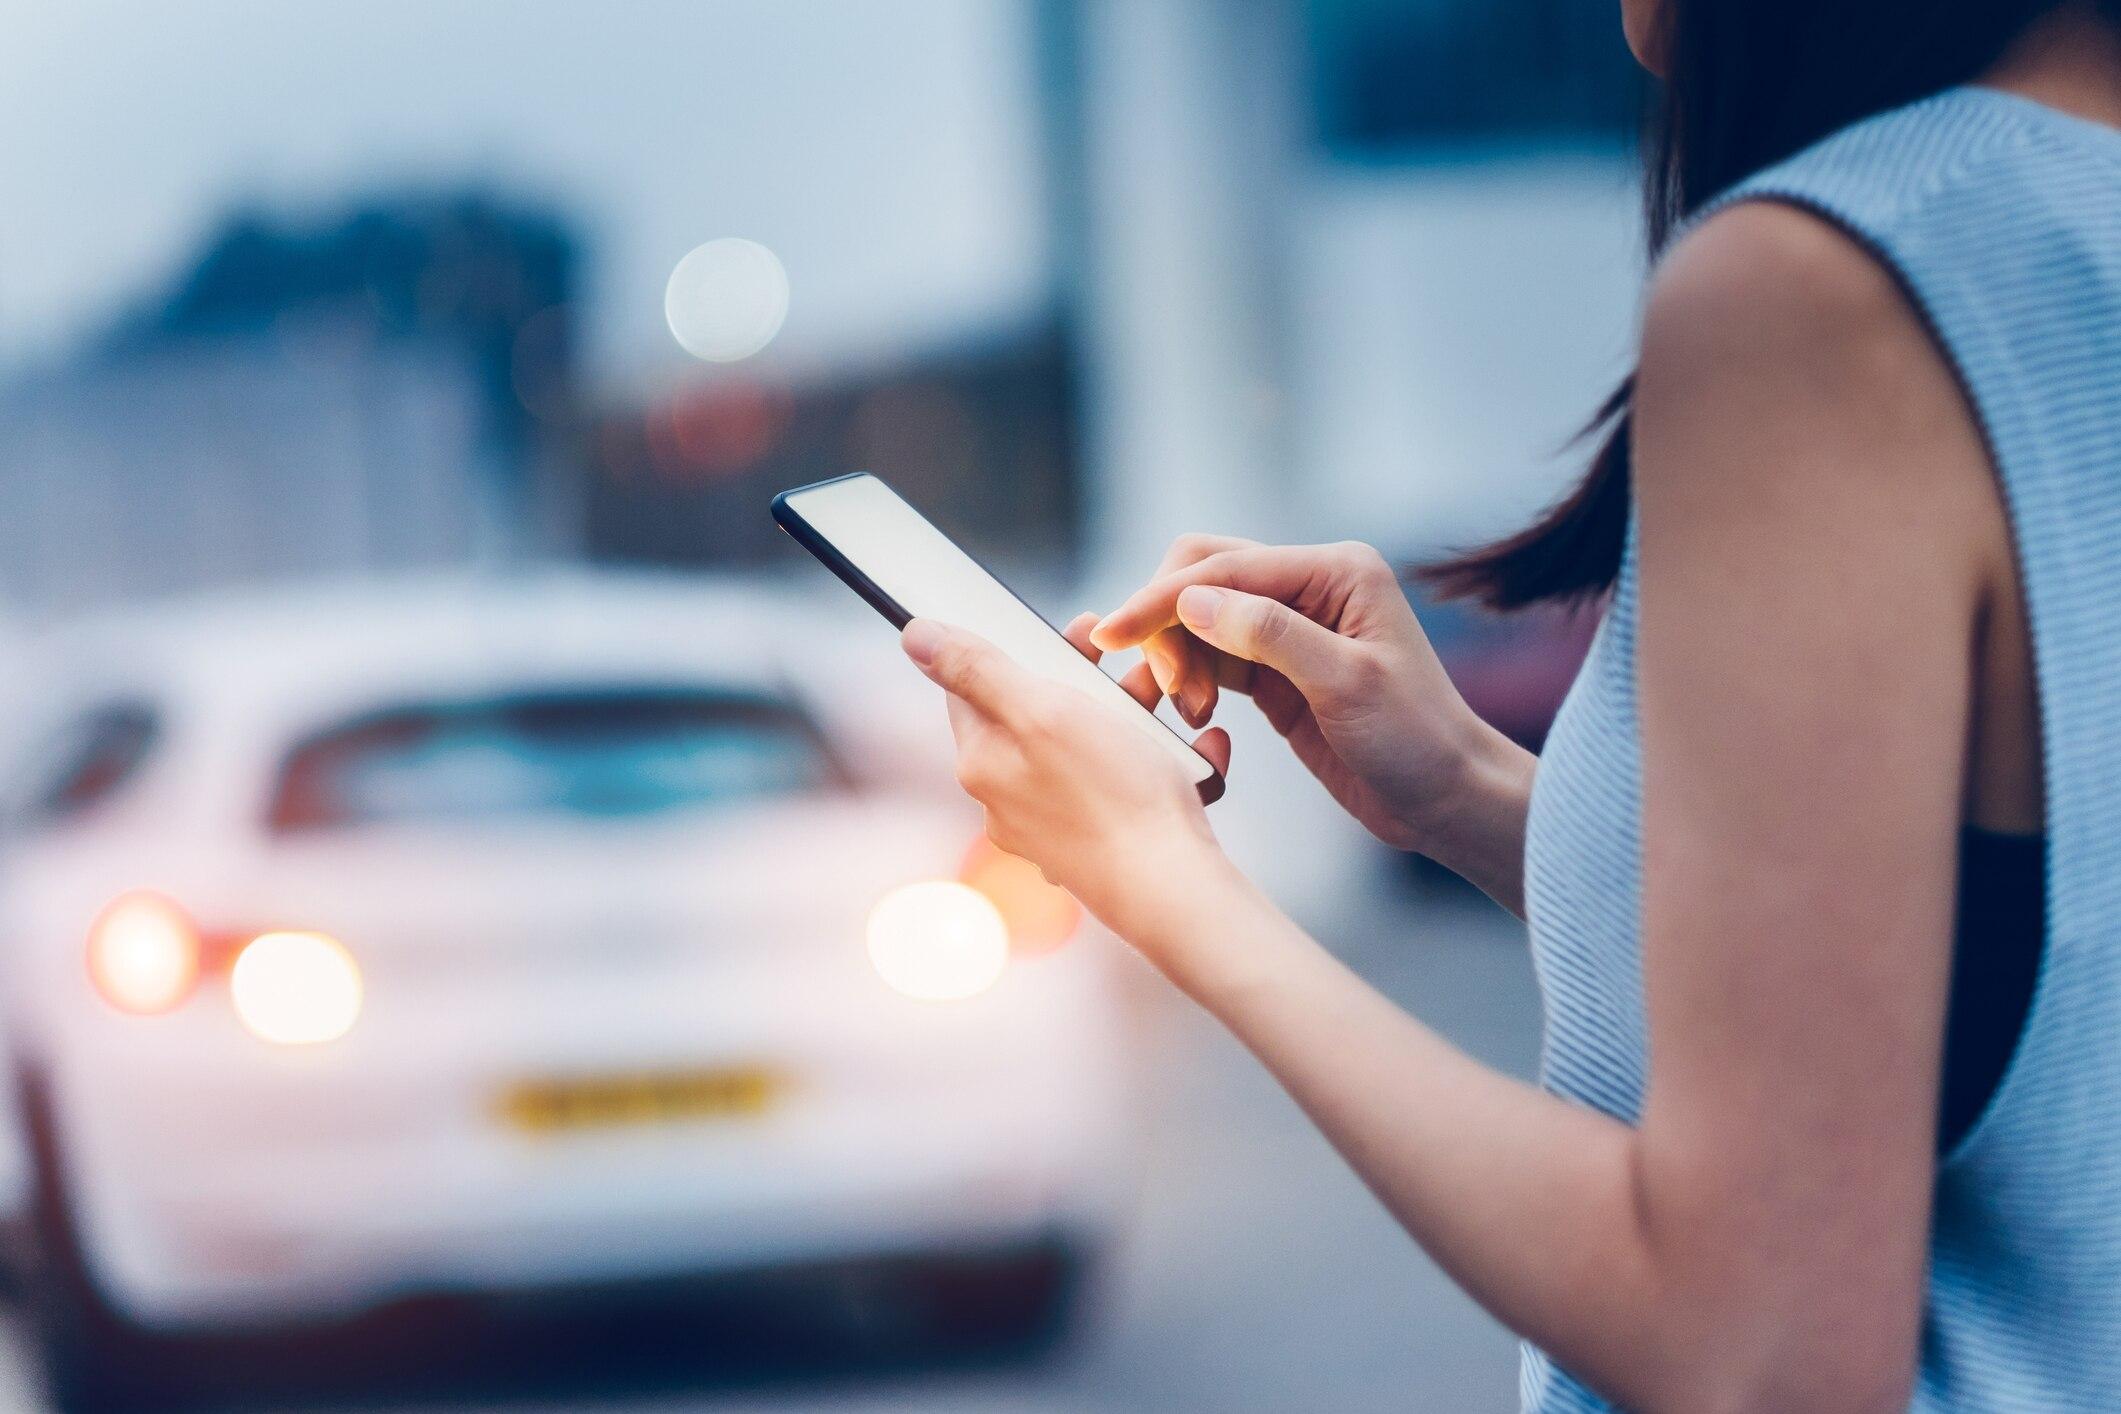 iPhone soll sich bald als digitaler Autoschlüssel nutzen lassen